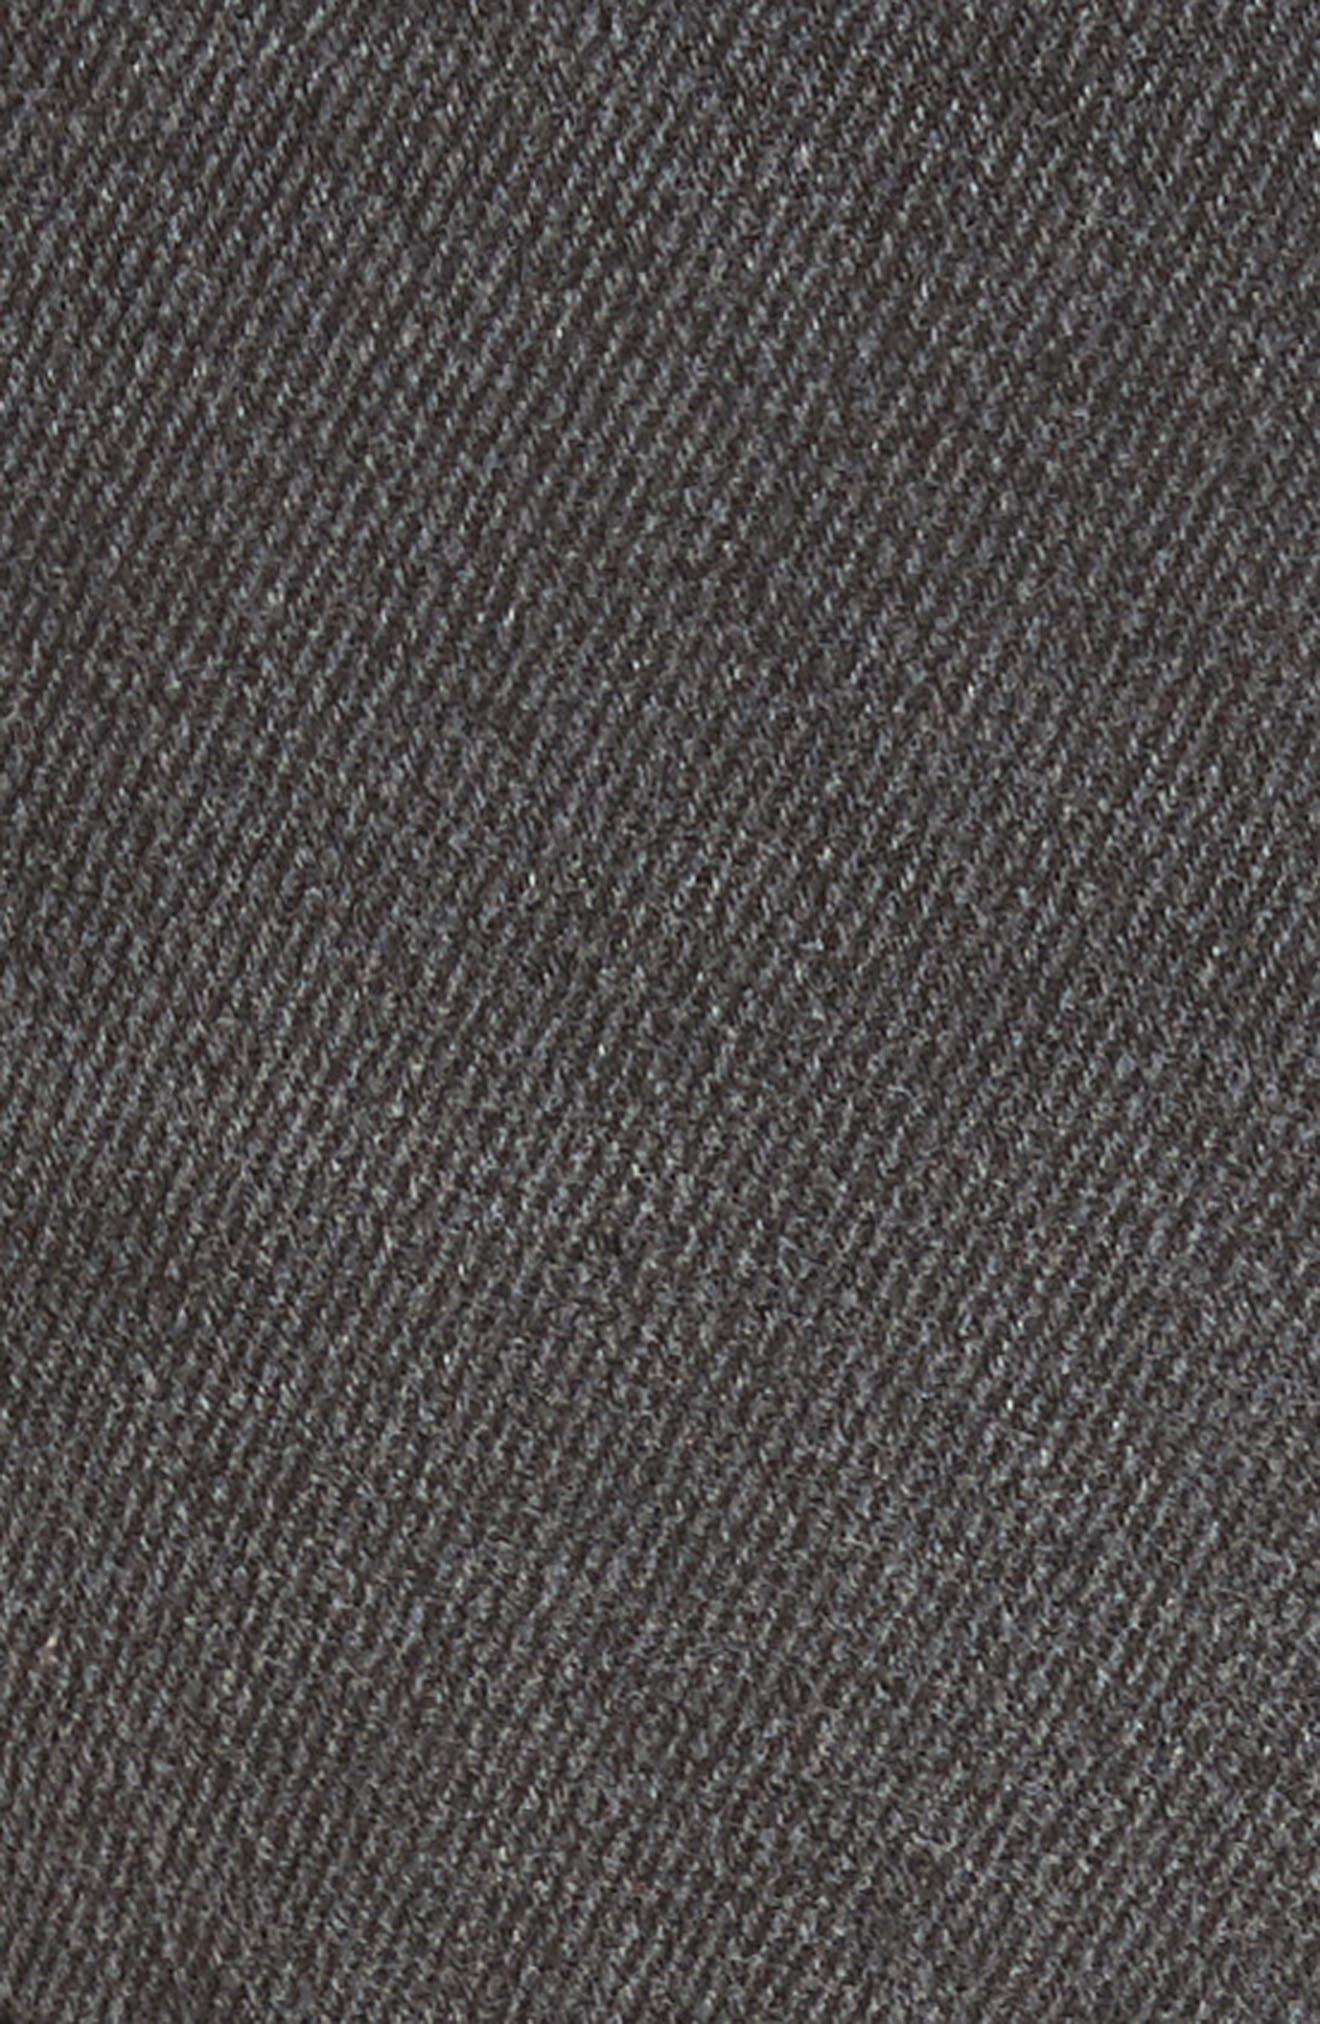 Sashed & Relaxed Cutoff Denim Shorts,                             Alternate thumbnail 6, color,                             001